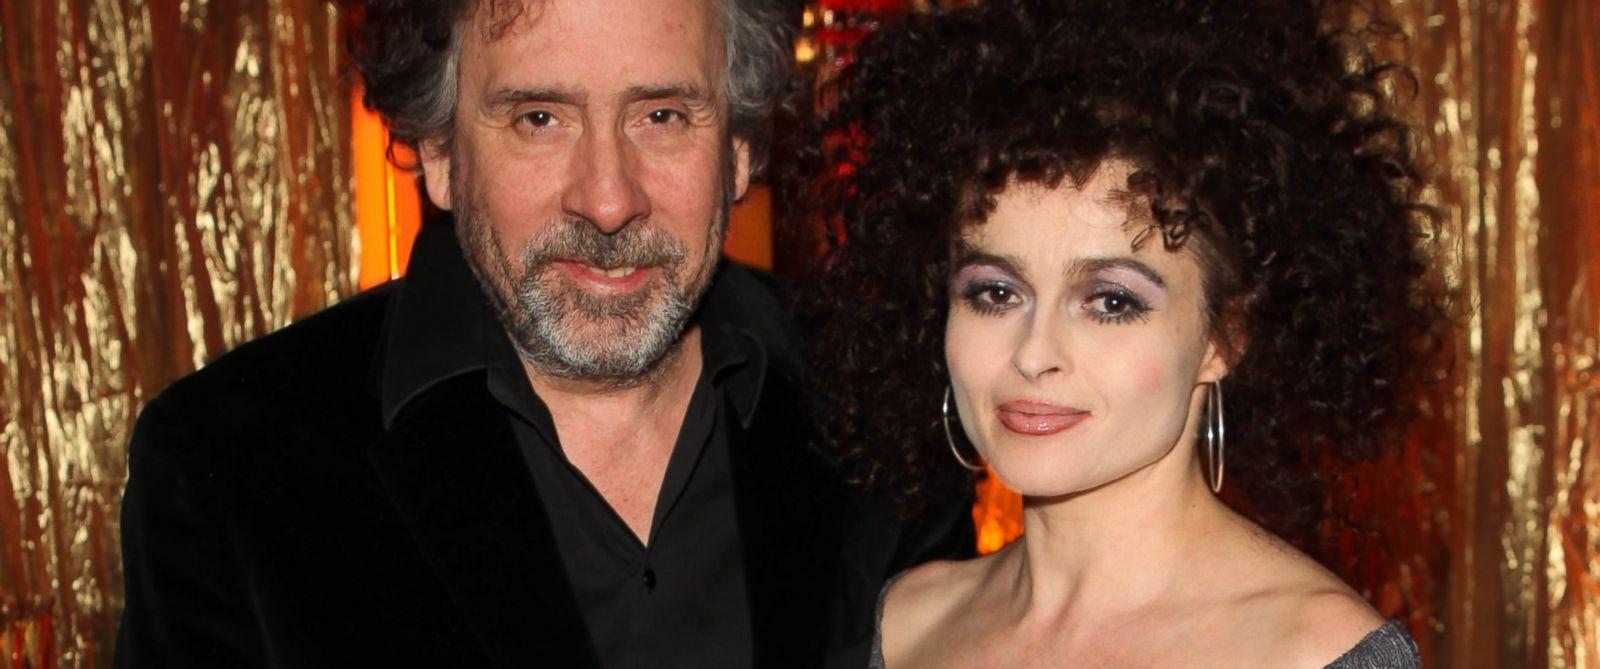 Helena Bonham Carter and Tim Burton Have Split - ABC News